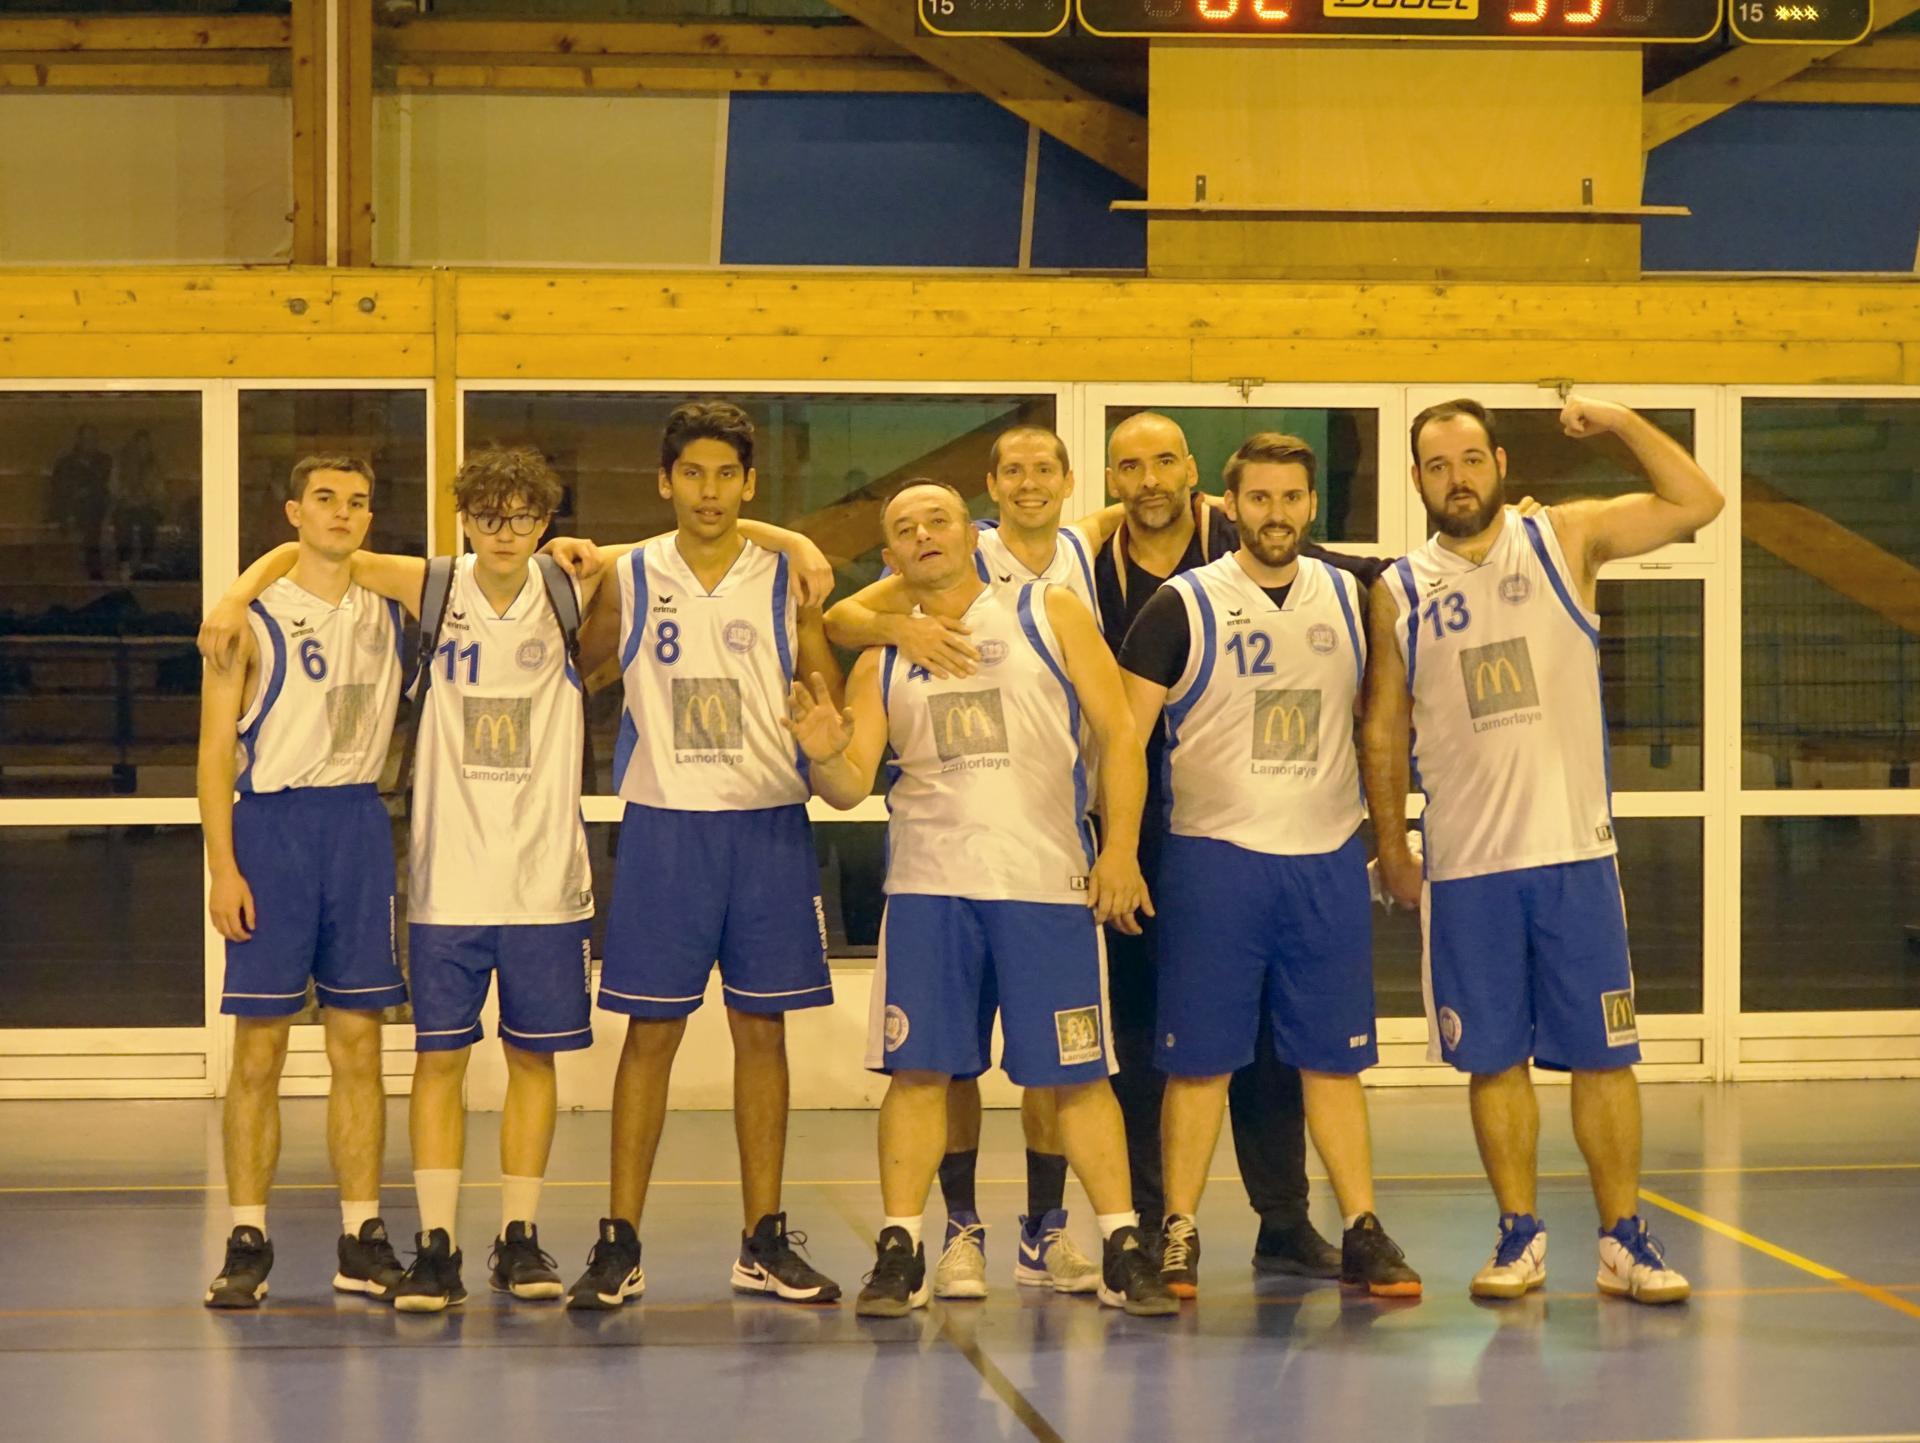 Seniors Masculins Sud Basket Oise Saison 2018-2019